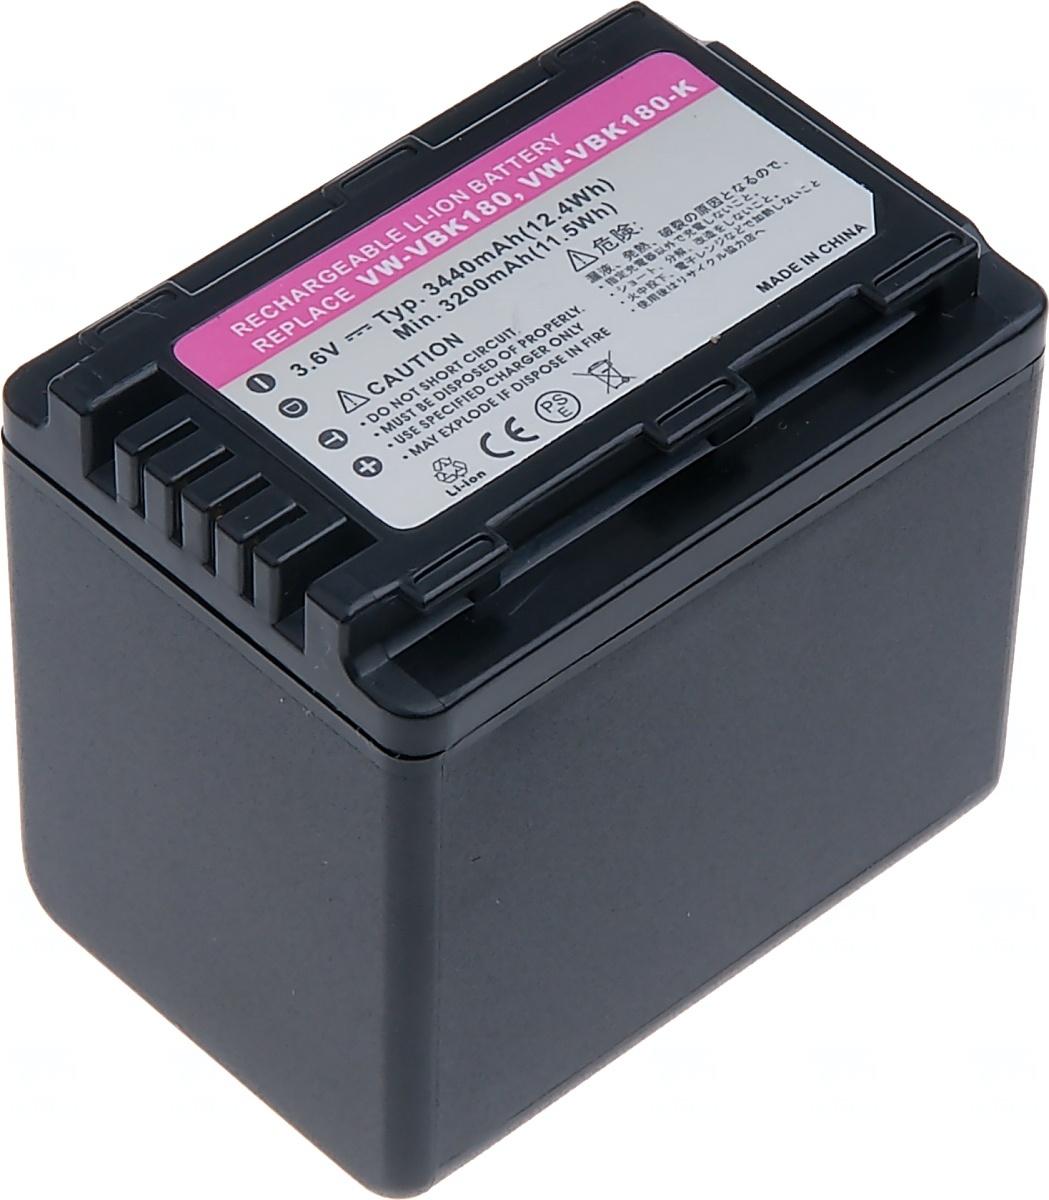 Baterie T6 power Panasonic VW-VBK360, 3440mAh, černá (Baterie a gripy)